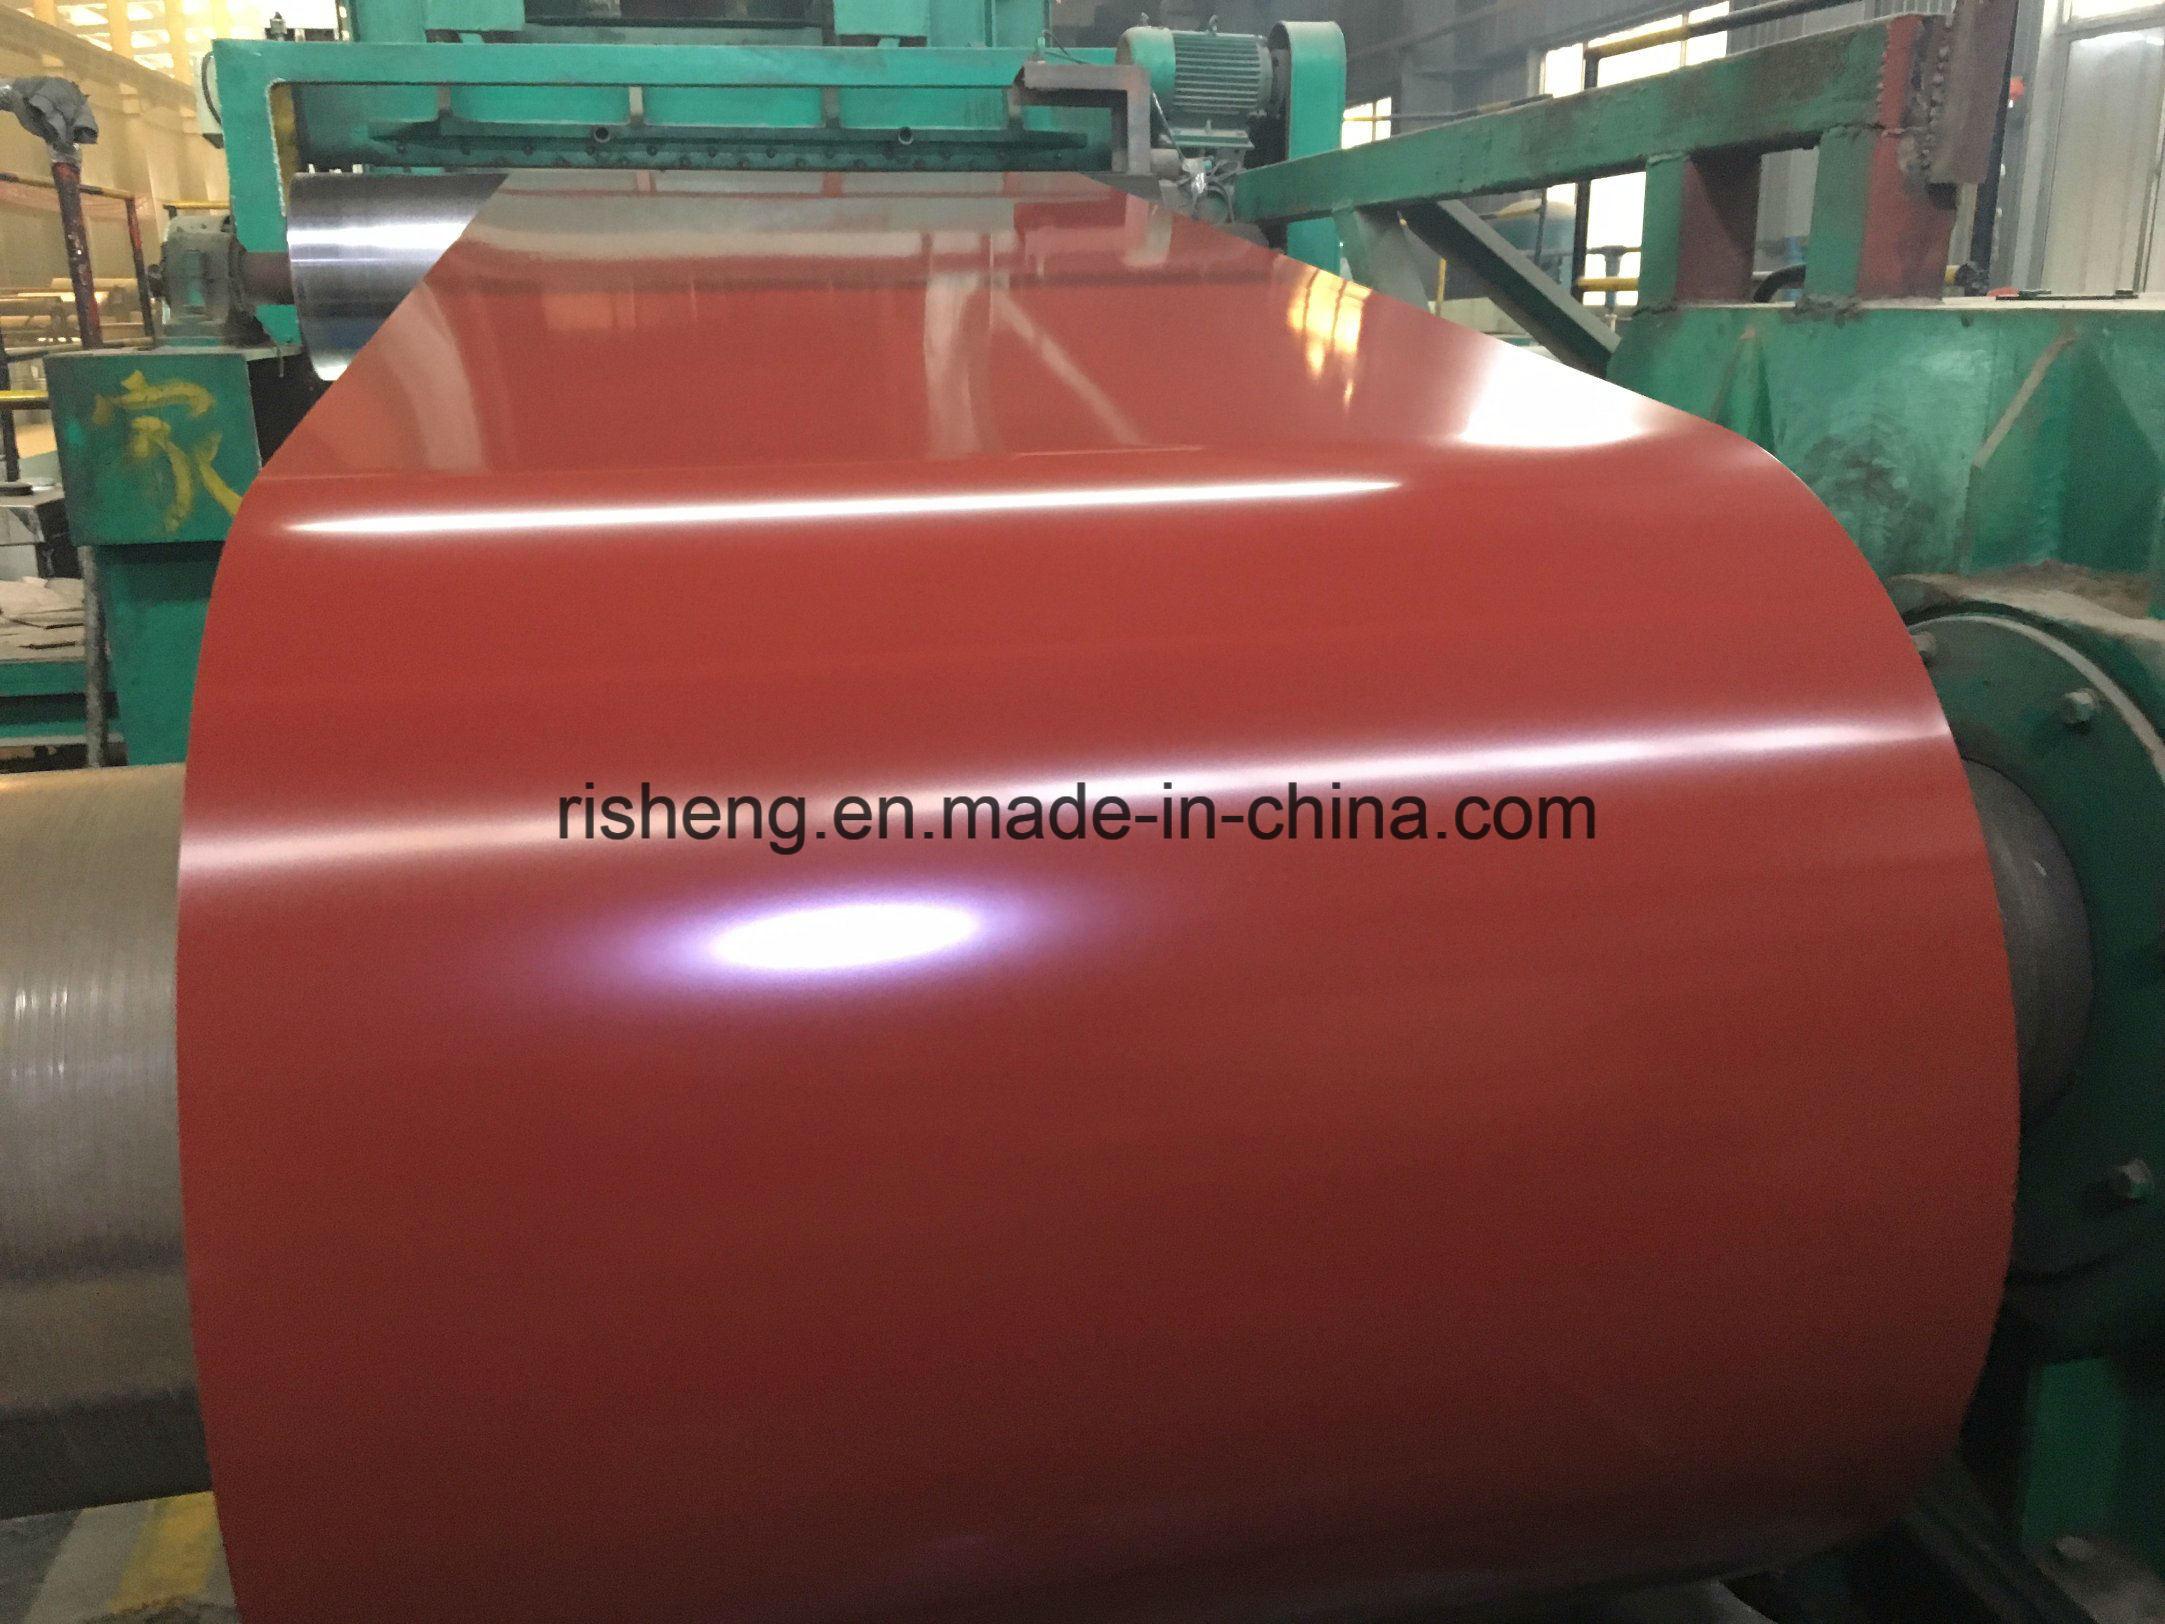 Factory Price Prepainted Galvanized Steel Coil PPGI